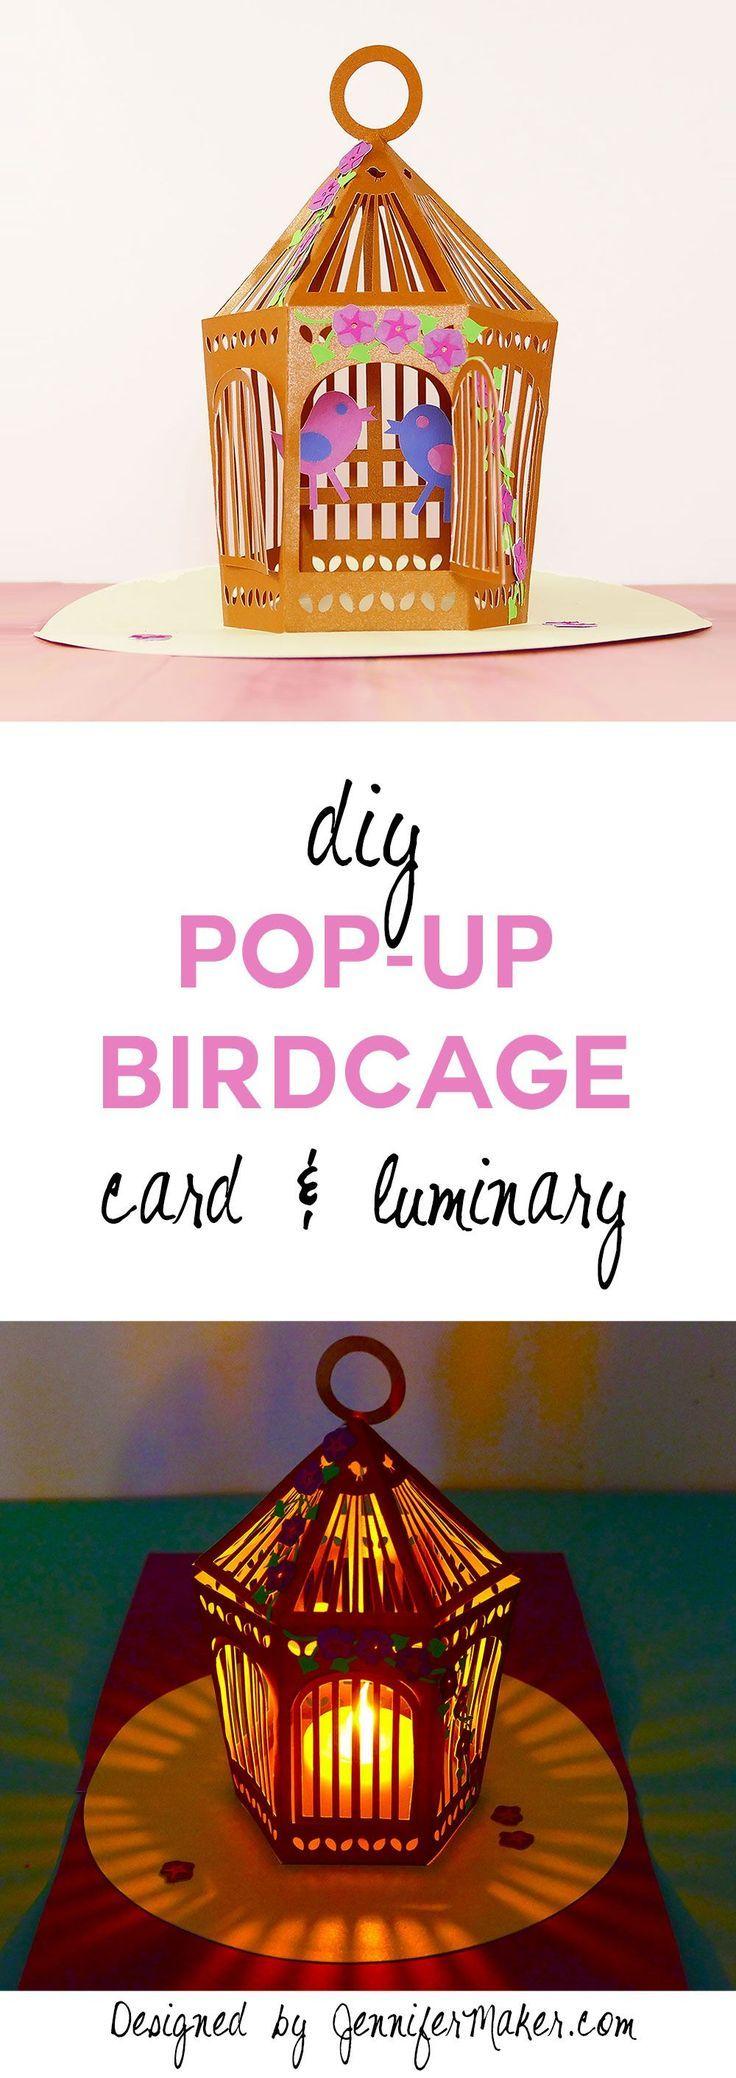 Pop Up Birdcage Make A Card Or Luminary Jennifer Maker Pop Up Card Templates Handmade Cards Diy Pop Up Cards